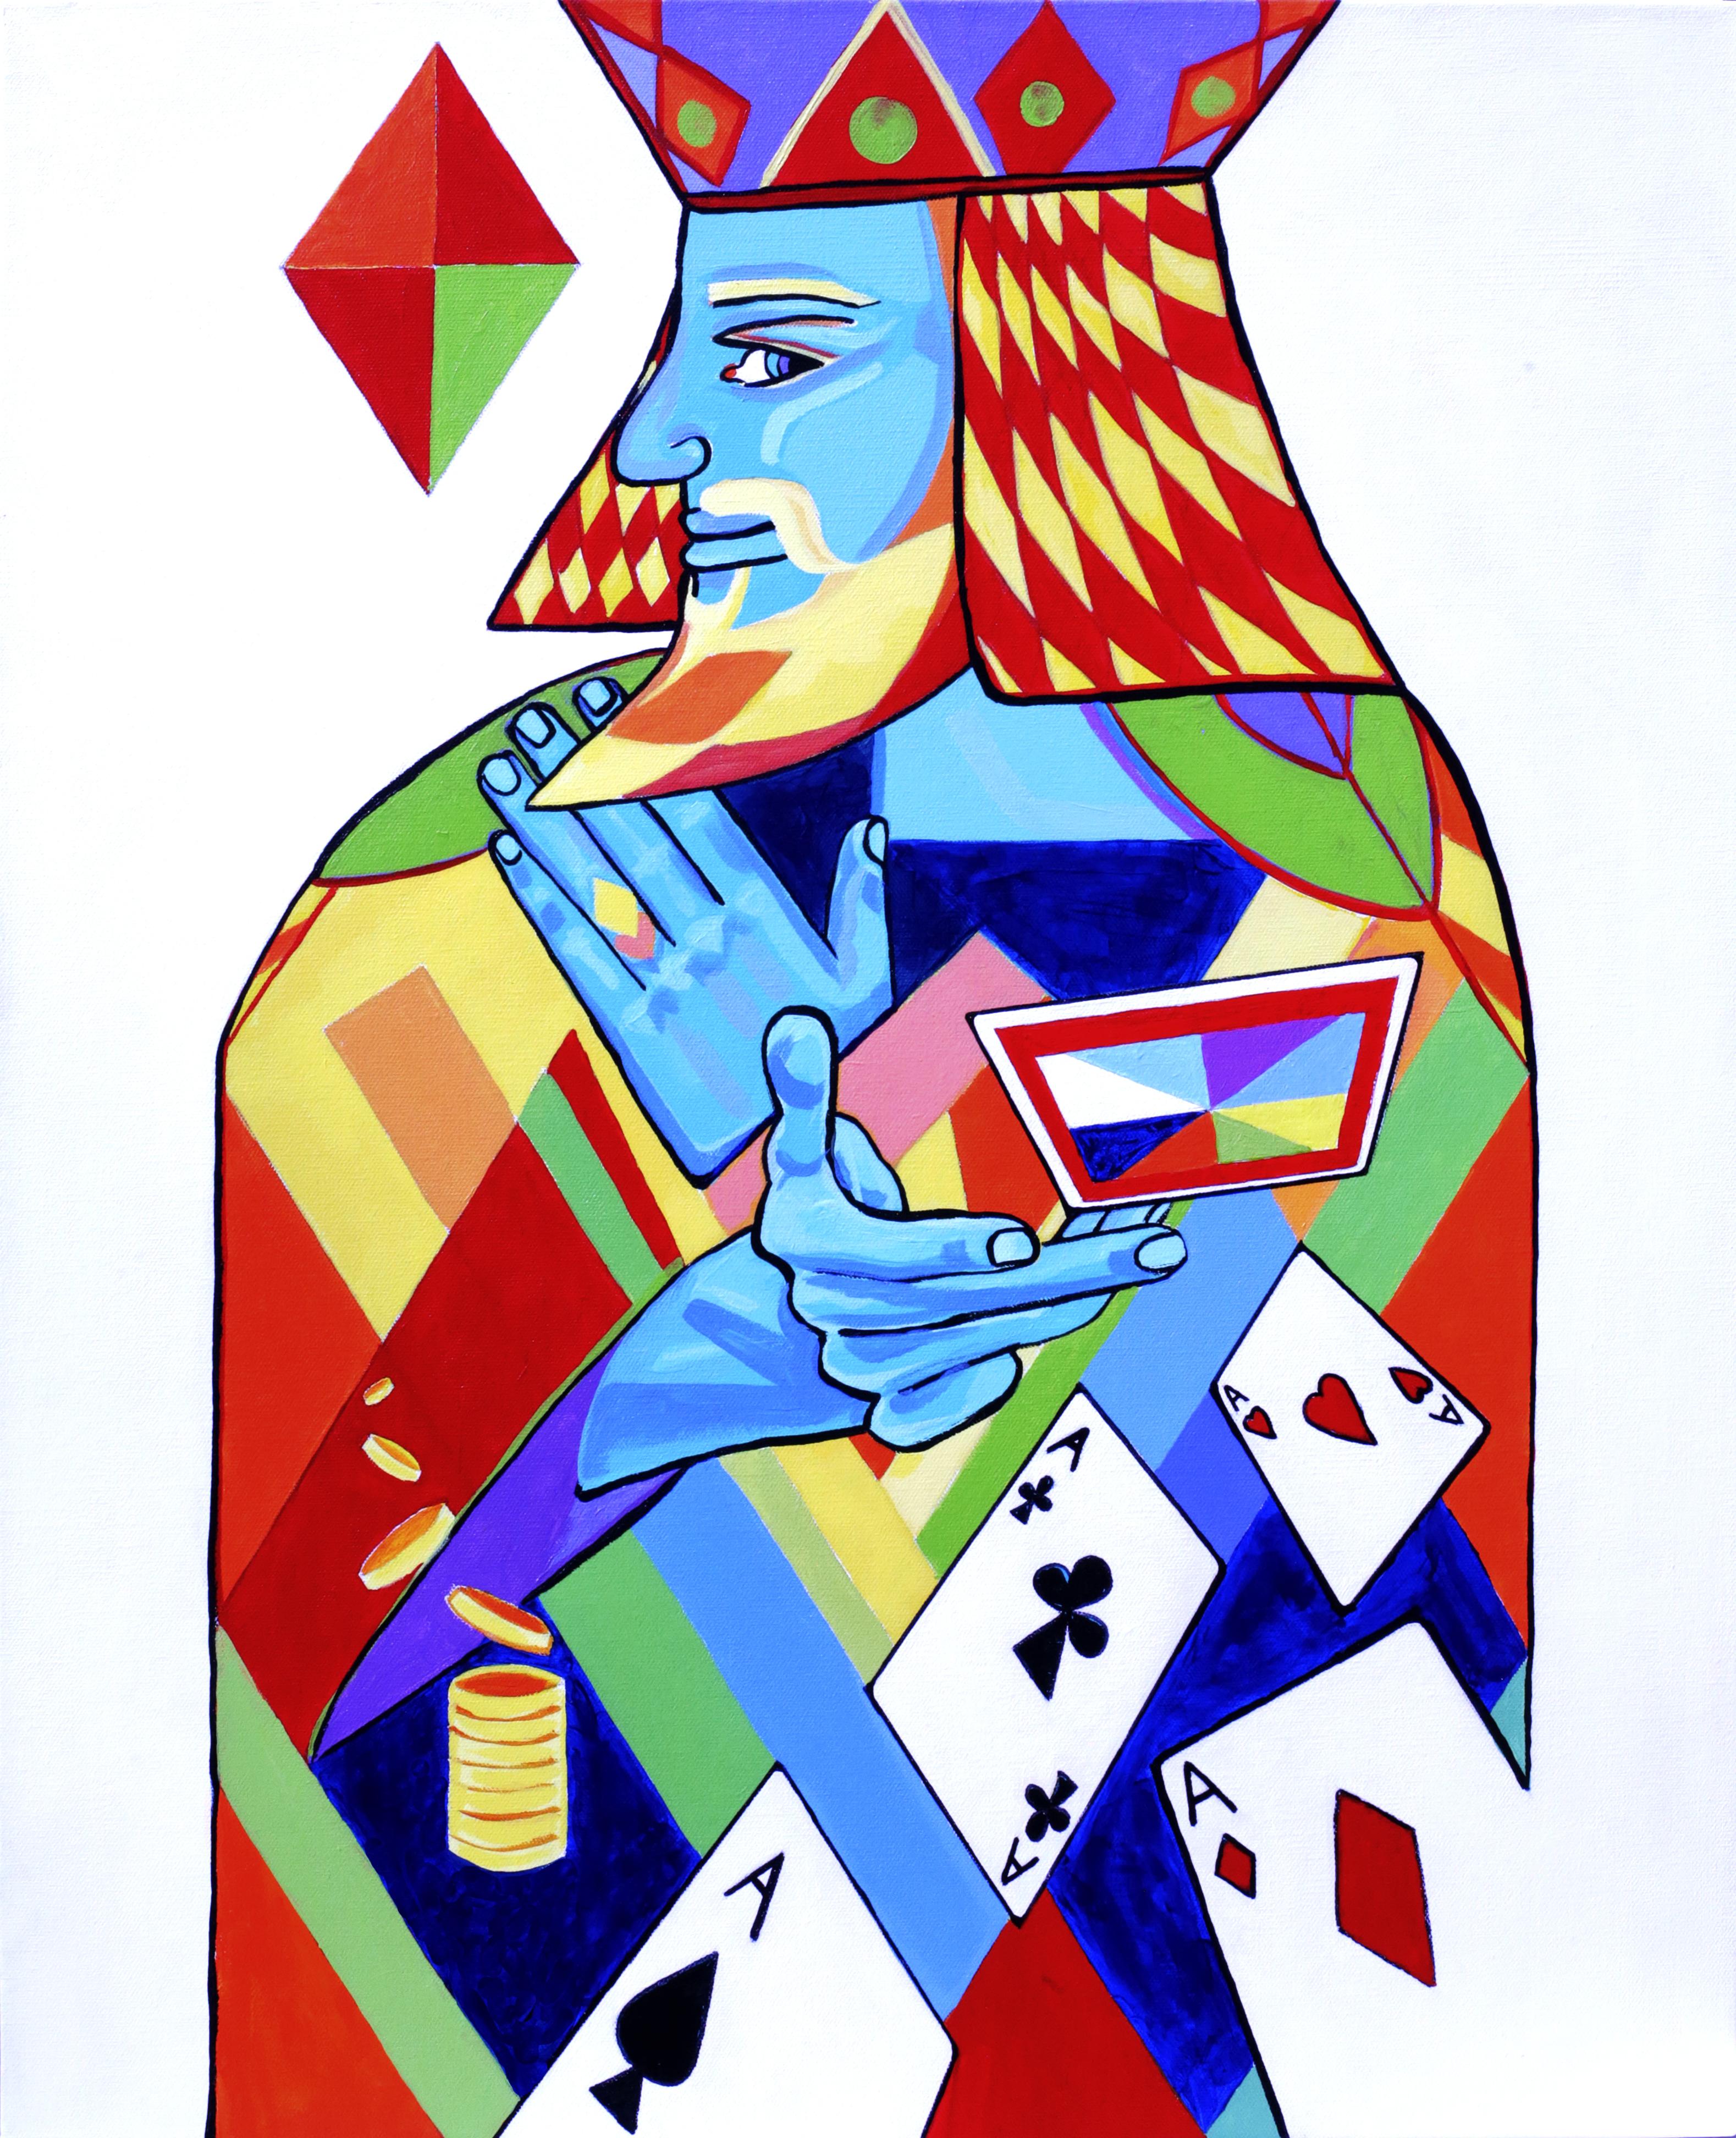 sharon loy anders_king of diamonds_large